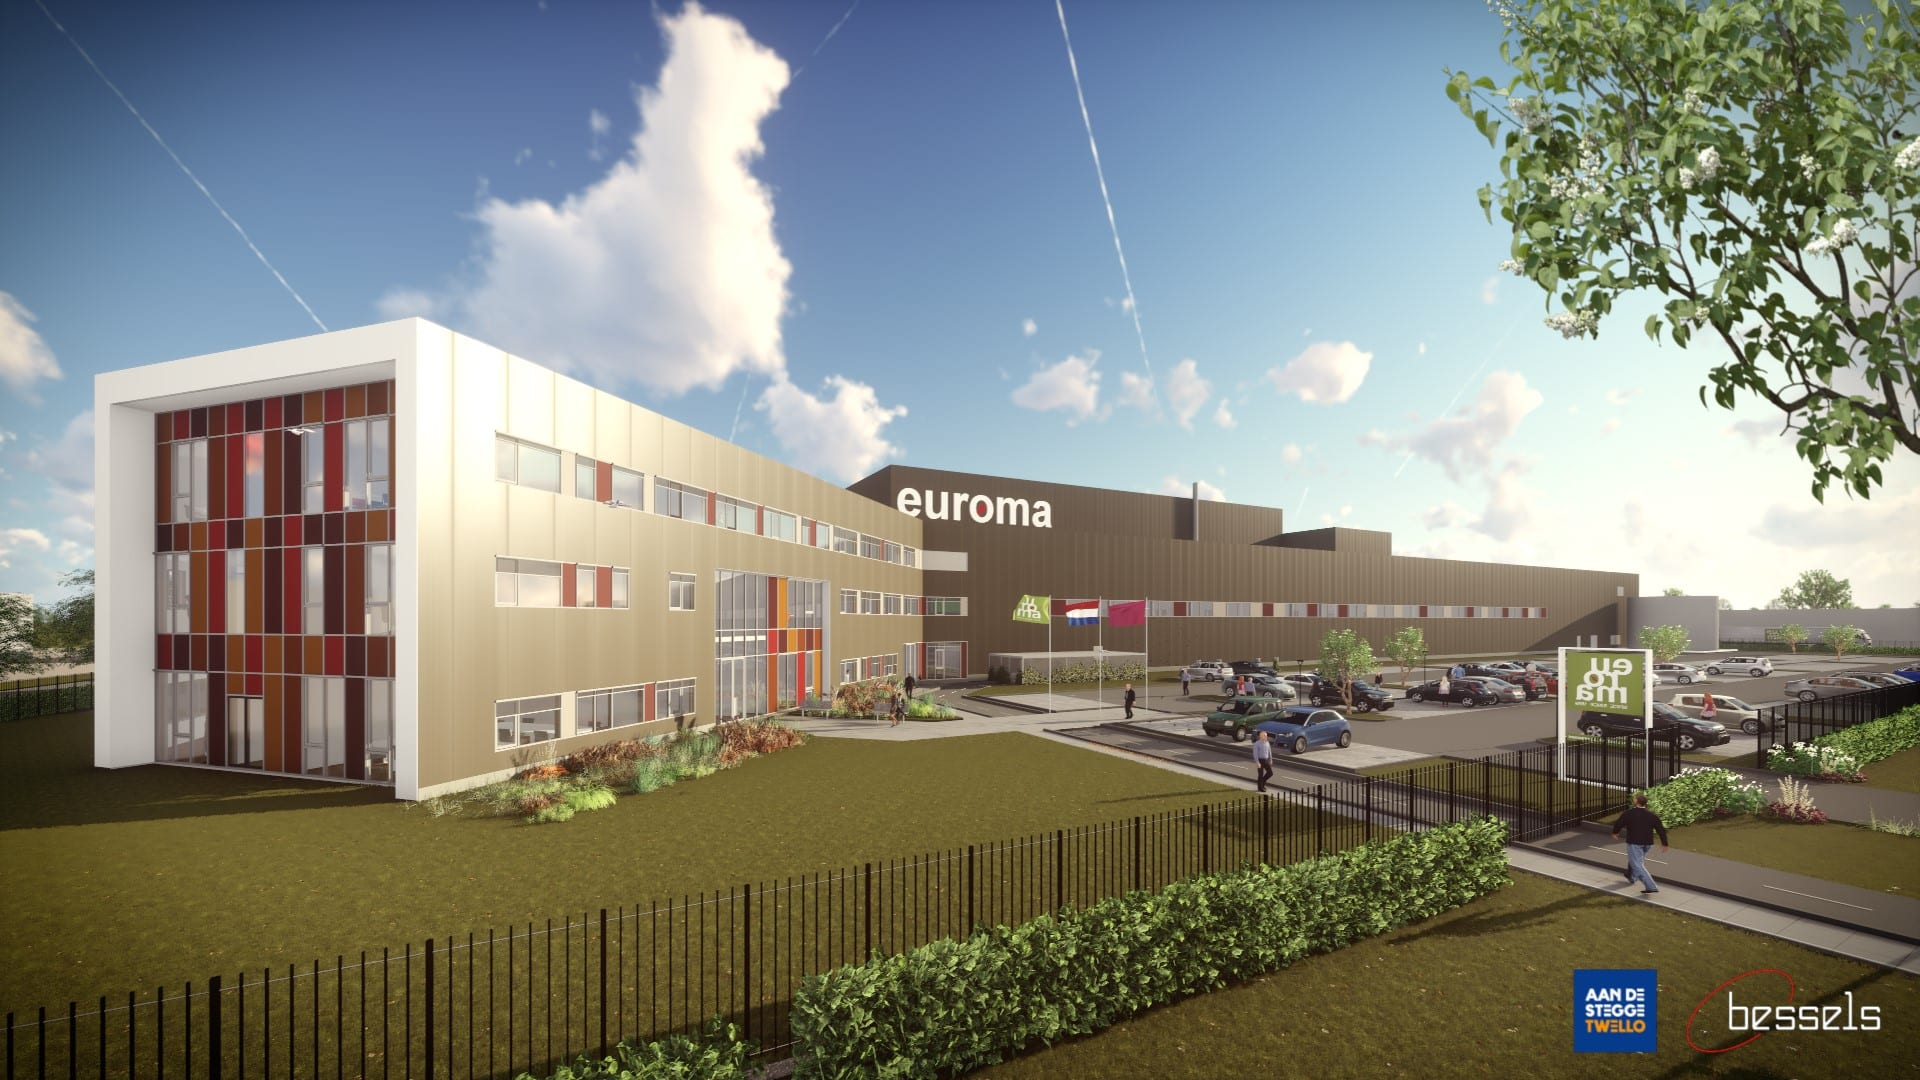 Nieuwbouw bedrijfspand Euroma Zwolle